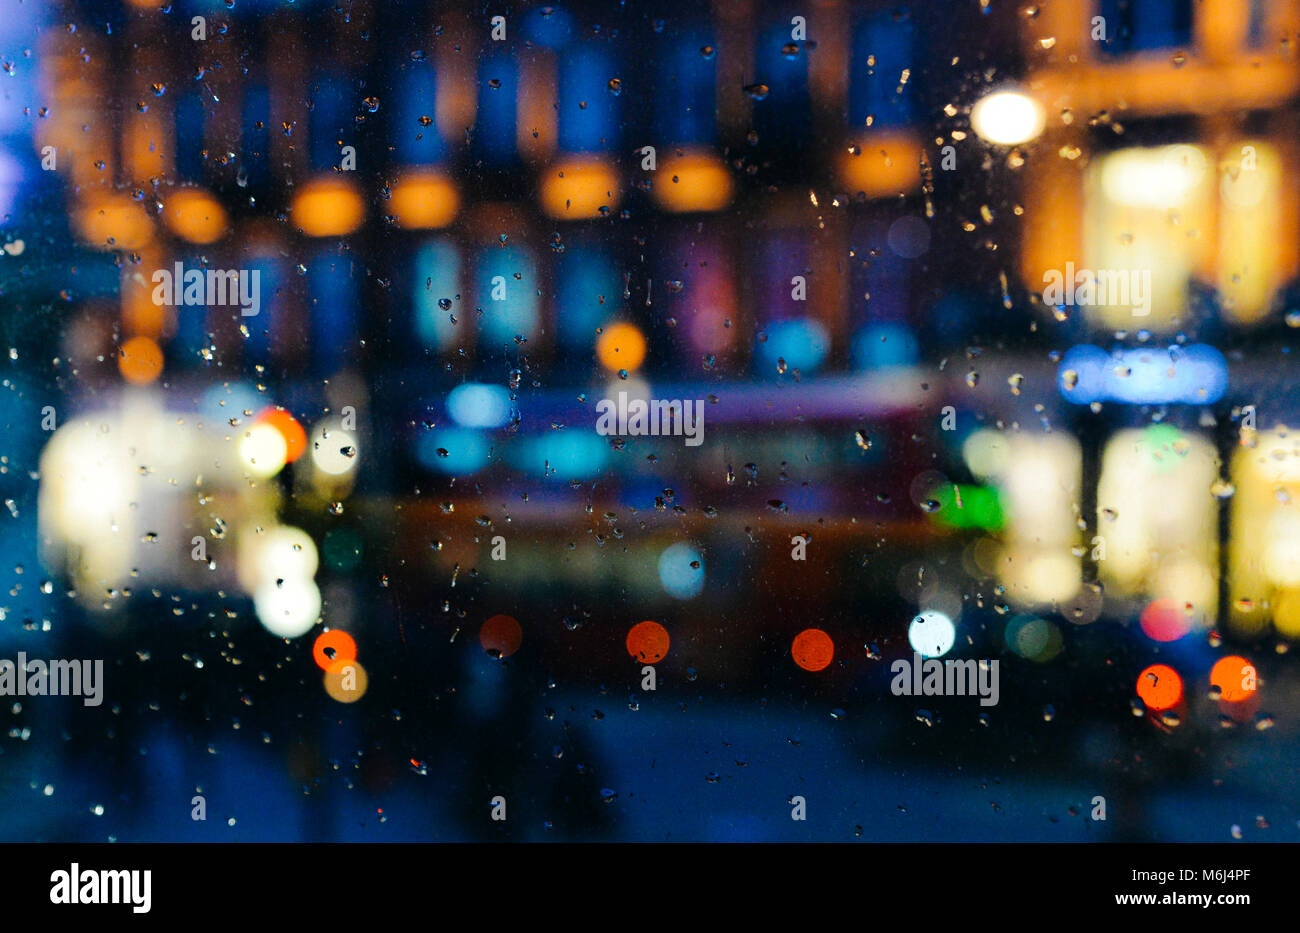 Emotional melancholic abstract background with defocused lights bokeh in London, UK behind rain drops in window - Stock Image